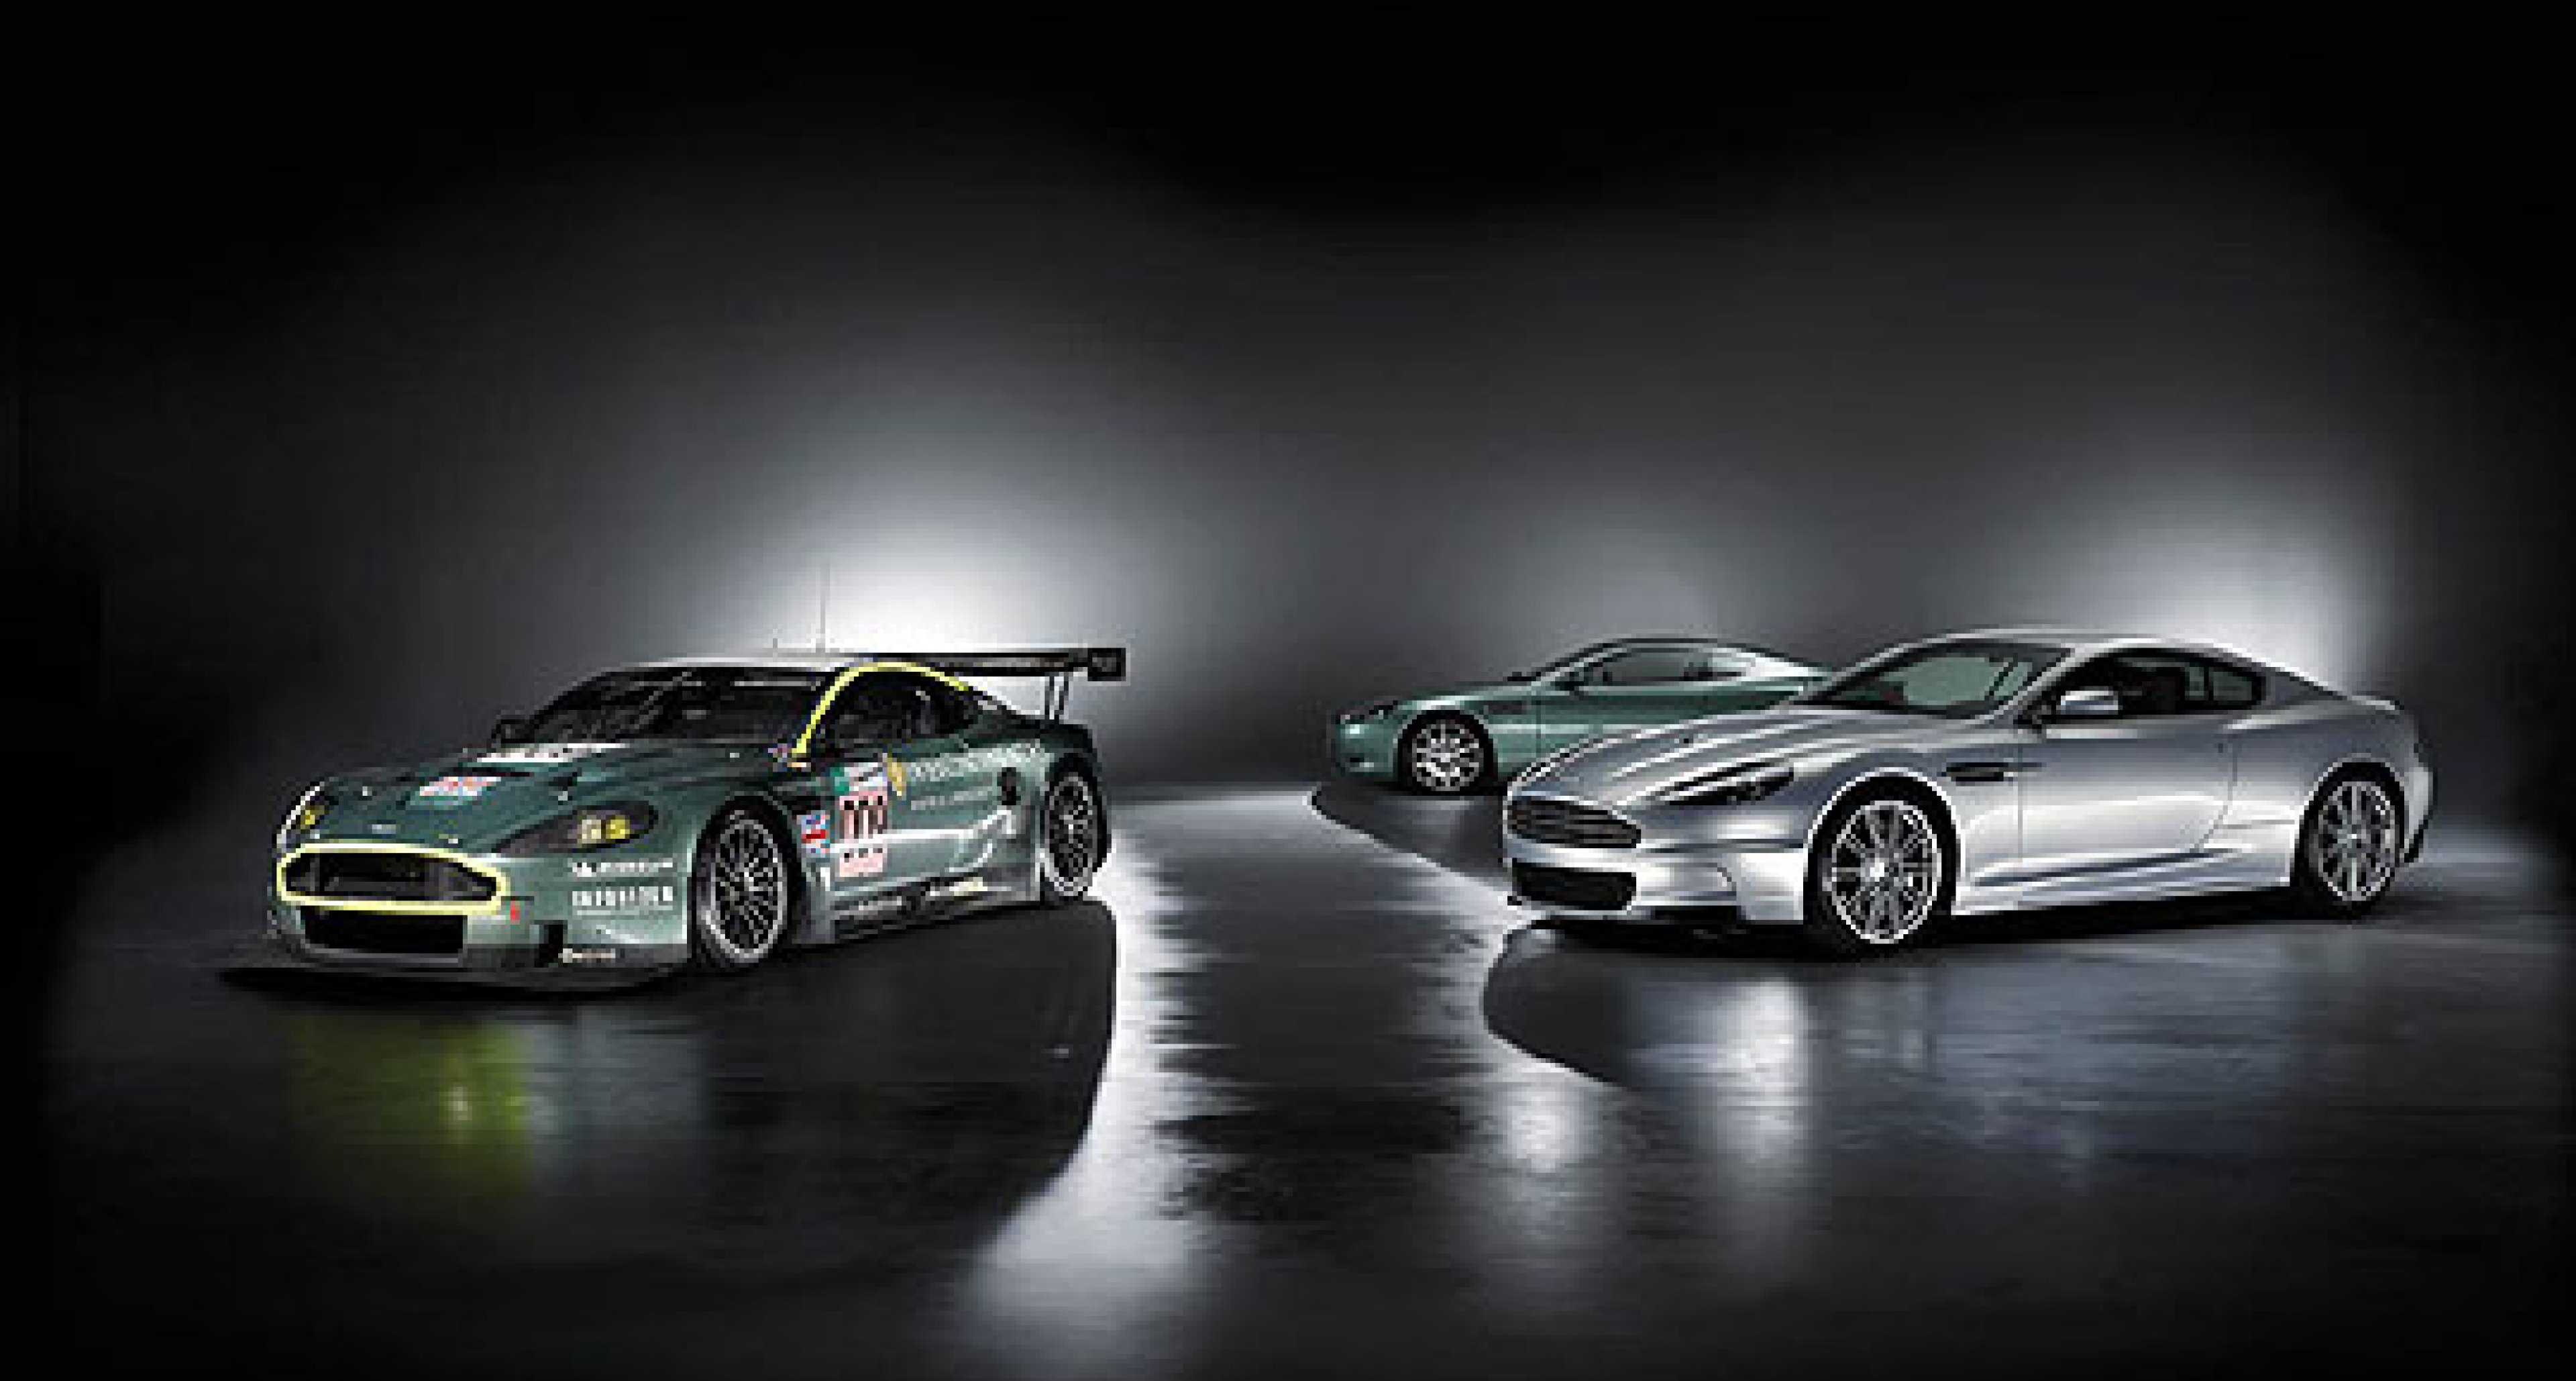 New Aston Martin DBS Unveiled at Pebble Beach